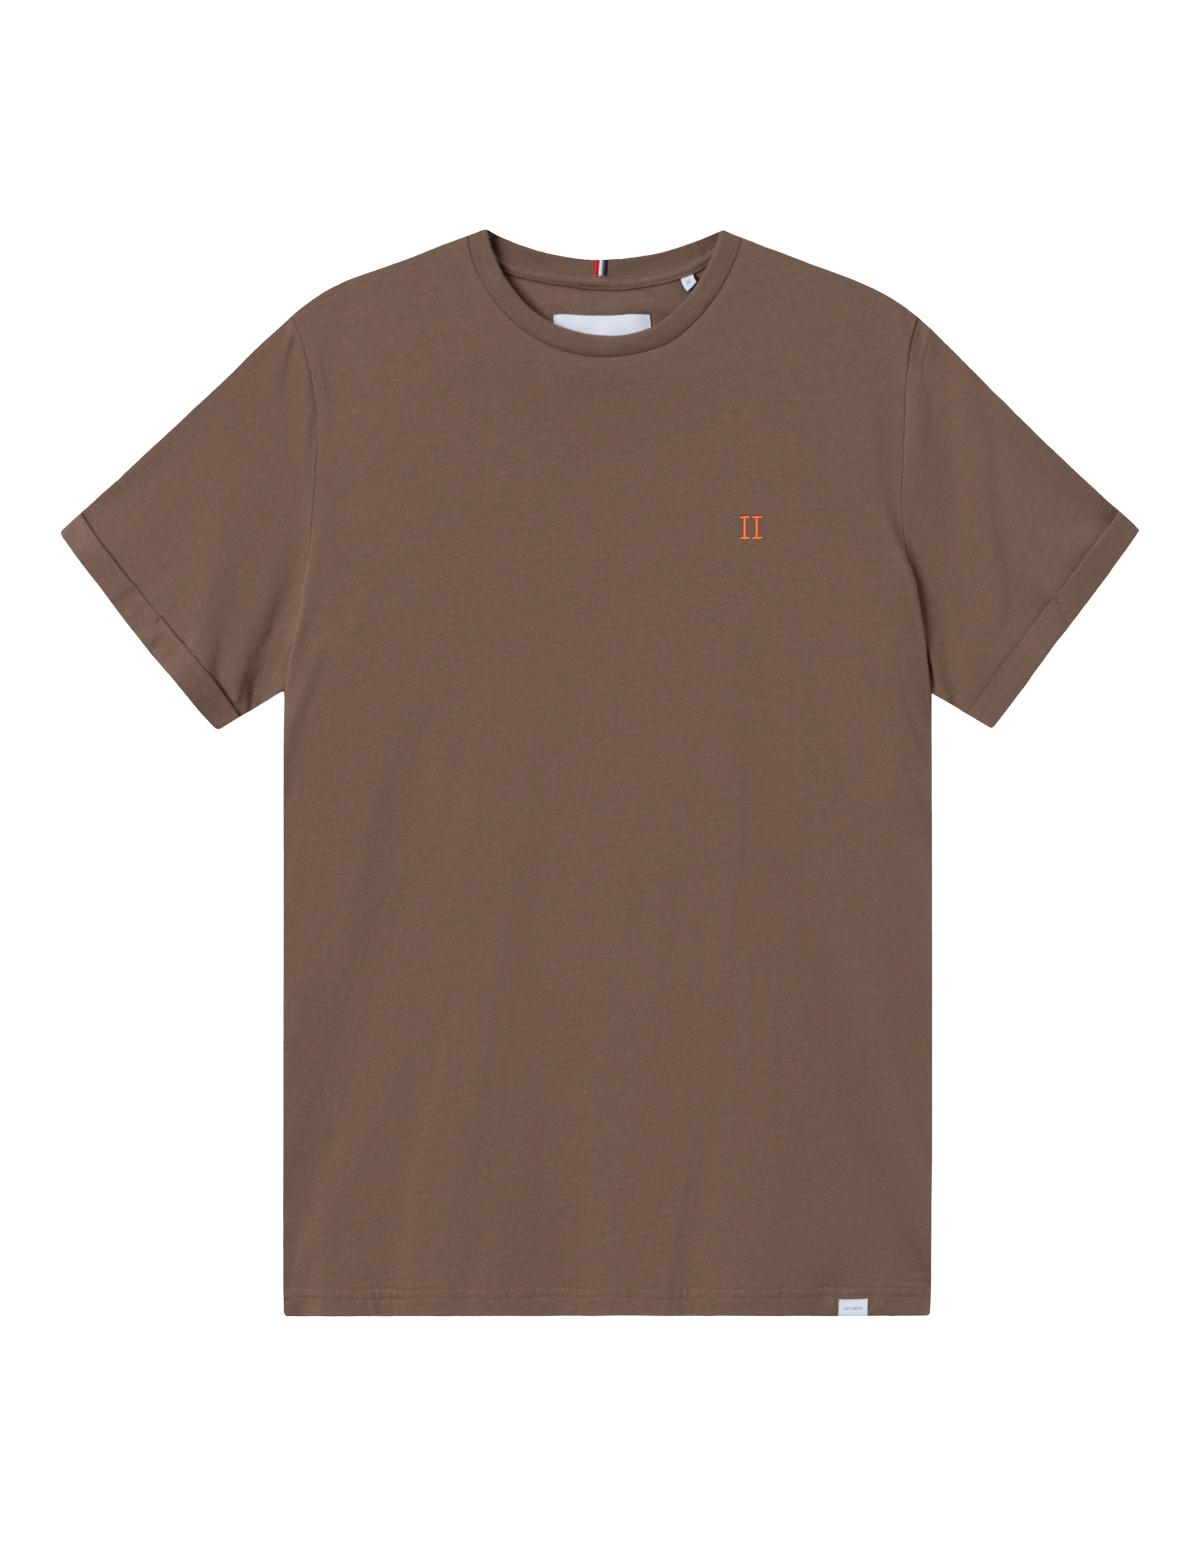 Les Deux Nørregaard t-shirt, mountain grey/orange, small